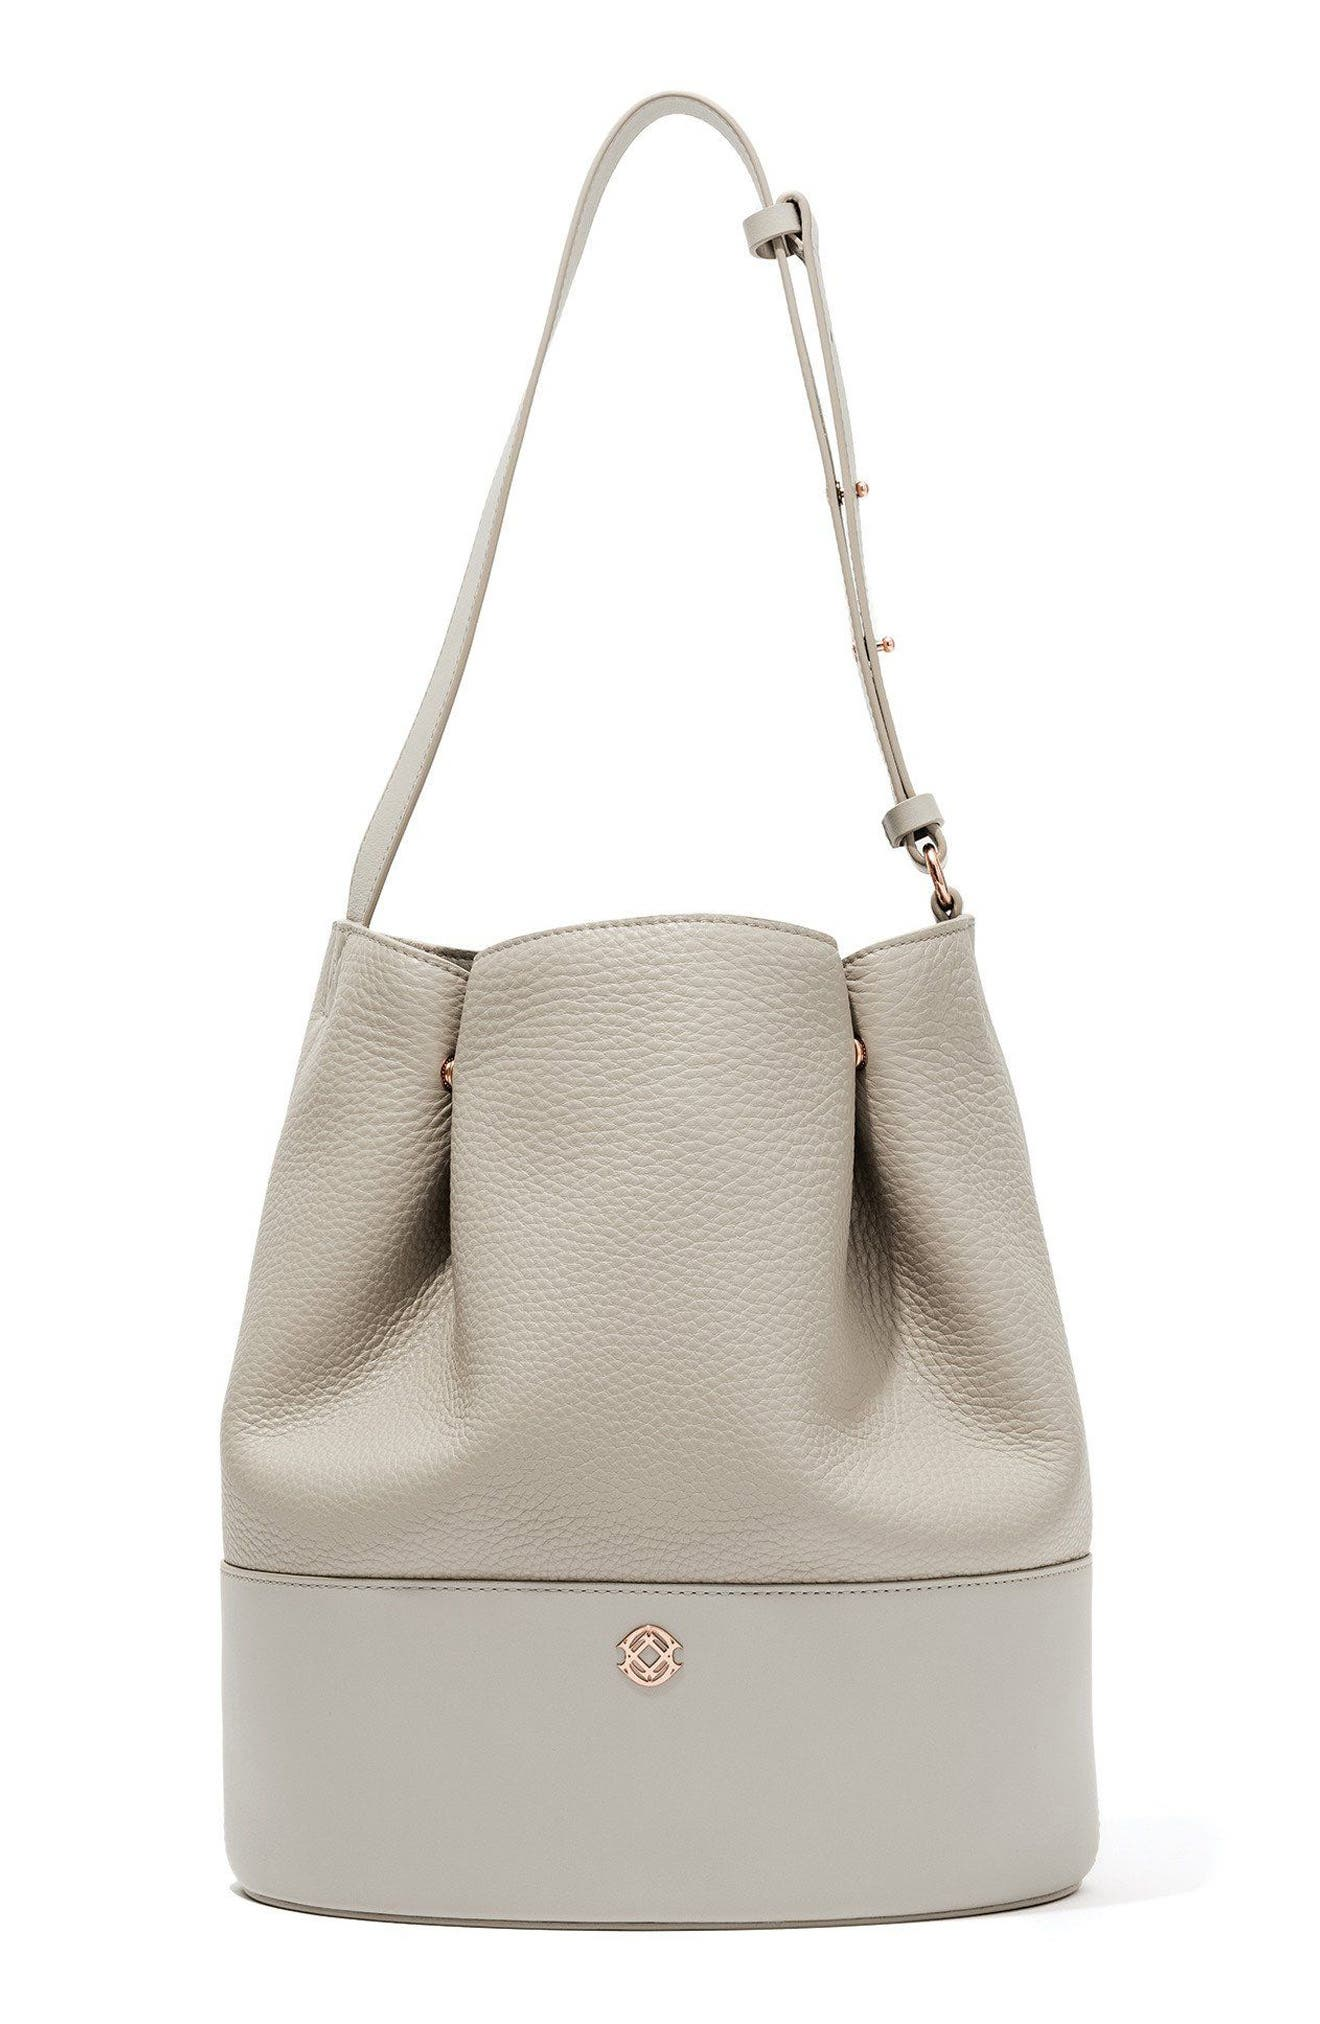 Ava Leather Bucket Bag,                             Main thumbnail 1, color,                             BONE